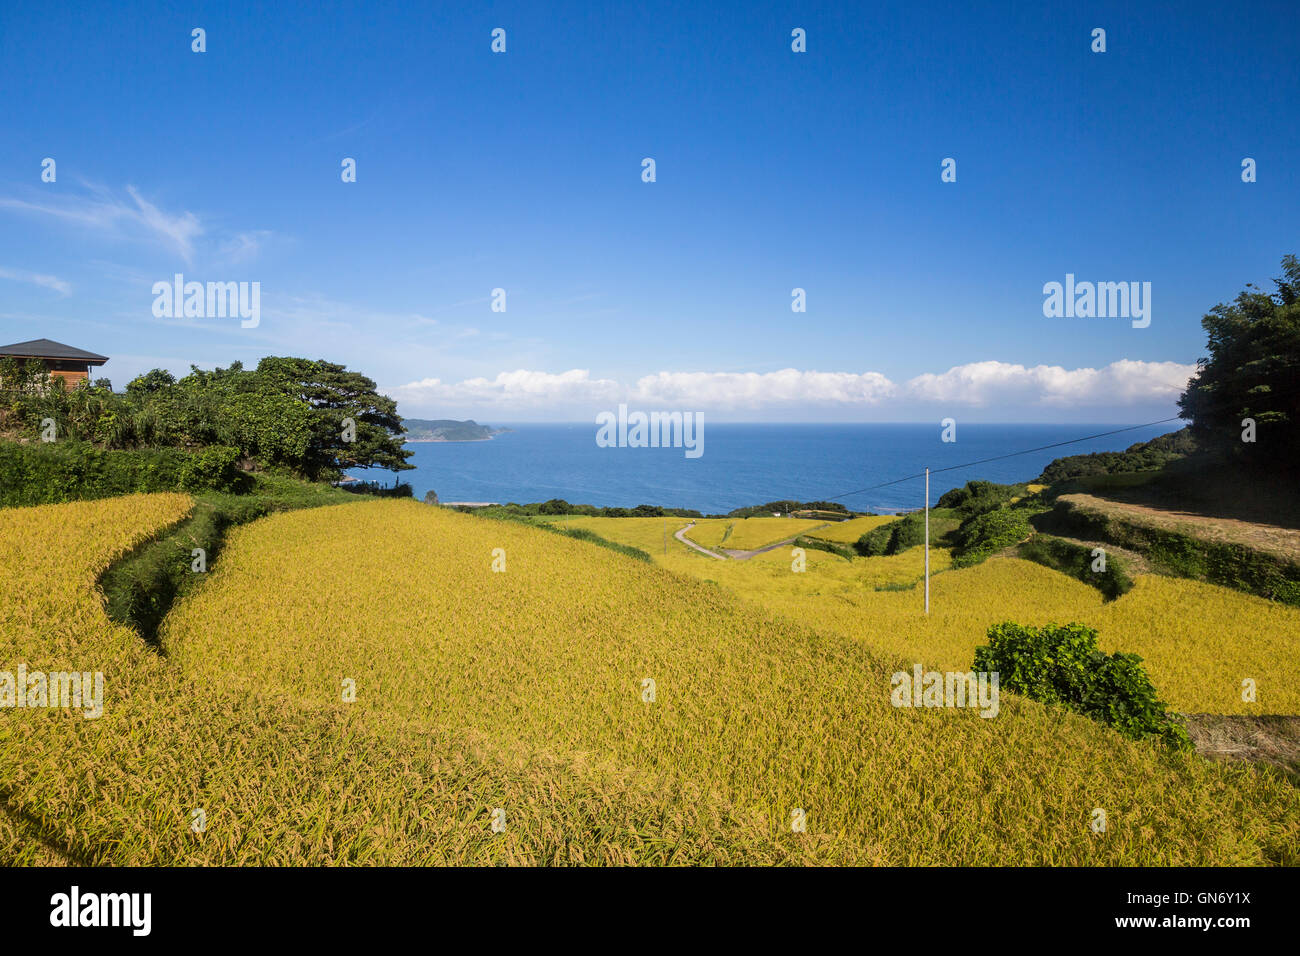 Rice Terraces of Higashi Ushirobata, Nagato, Yamaguchi Prefecture, Nagato, Japan - Stock Image